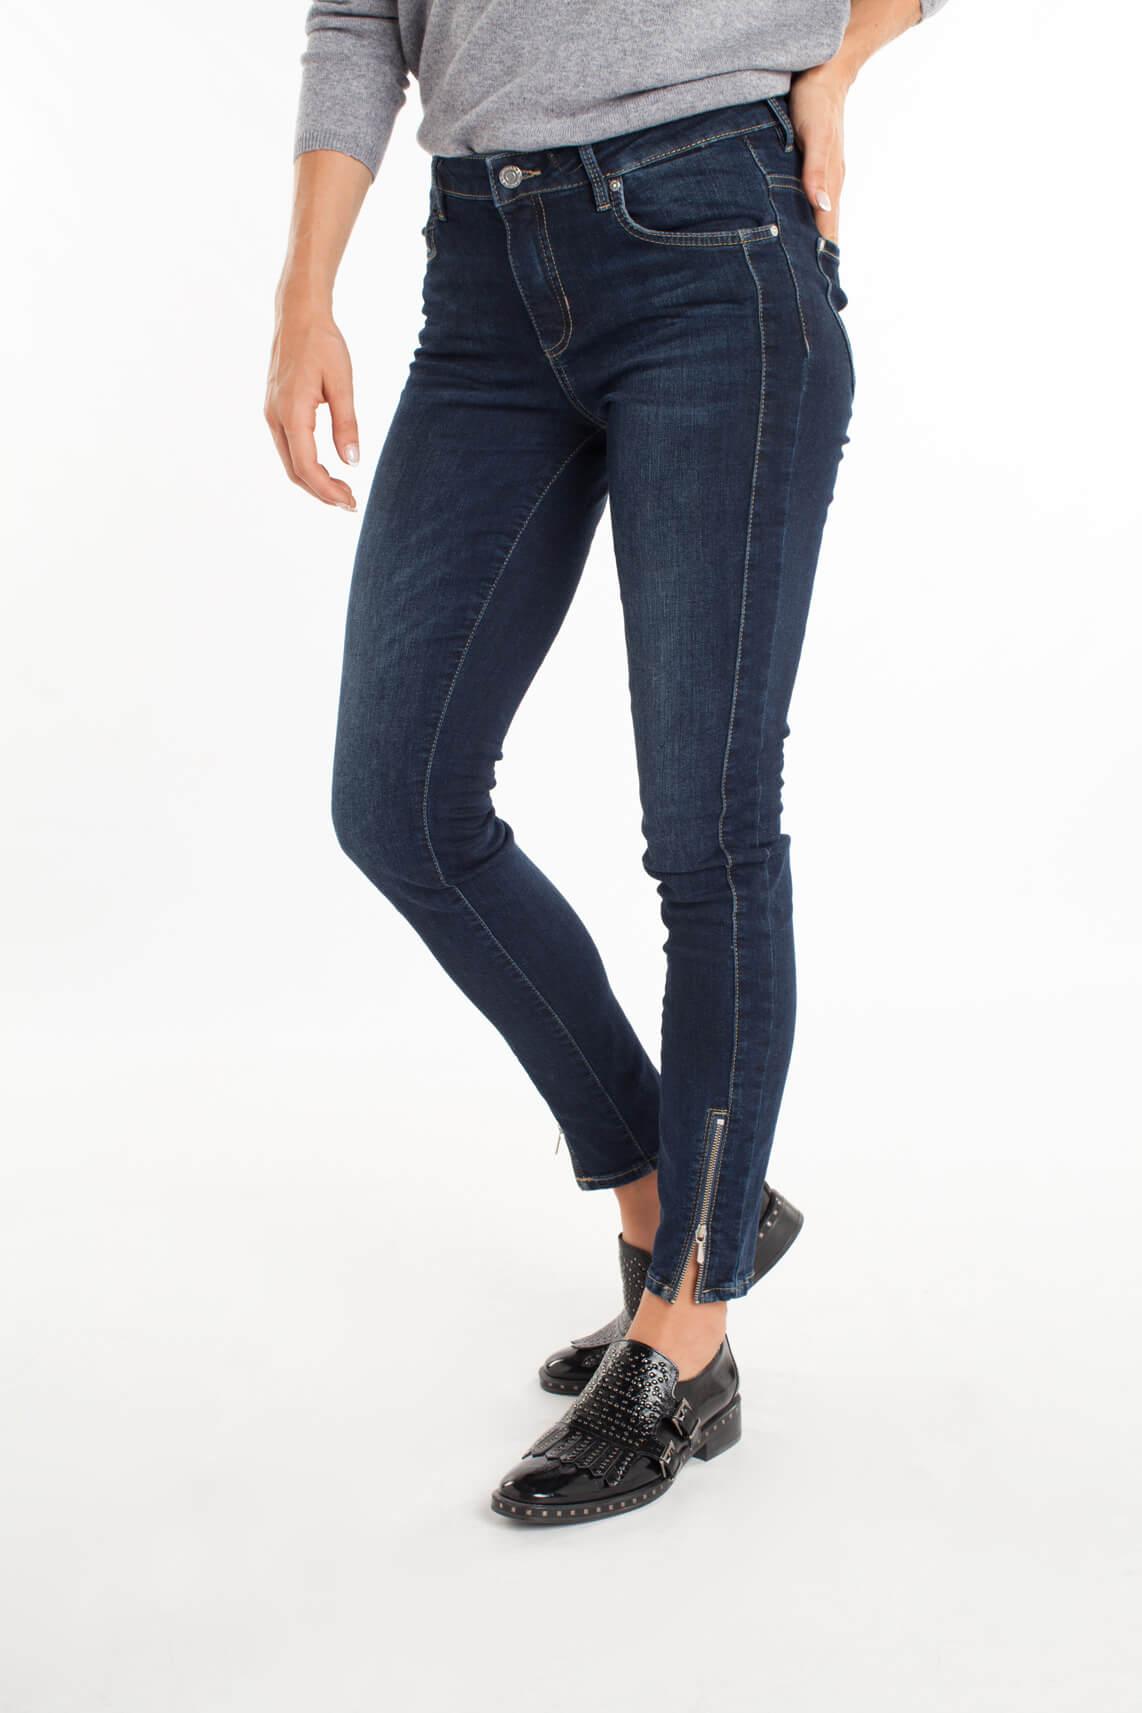 Rosner Dames Antonia jeans met rits detail Blauw